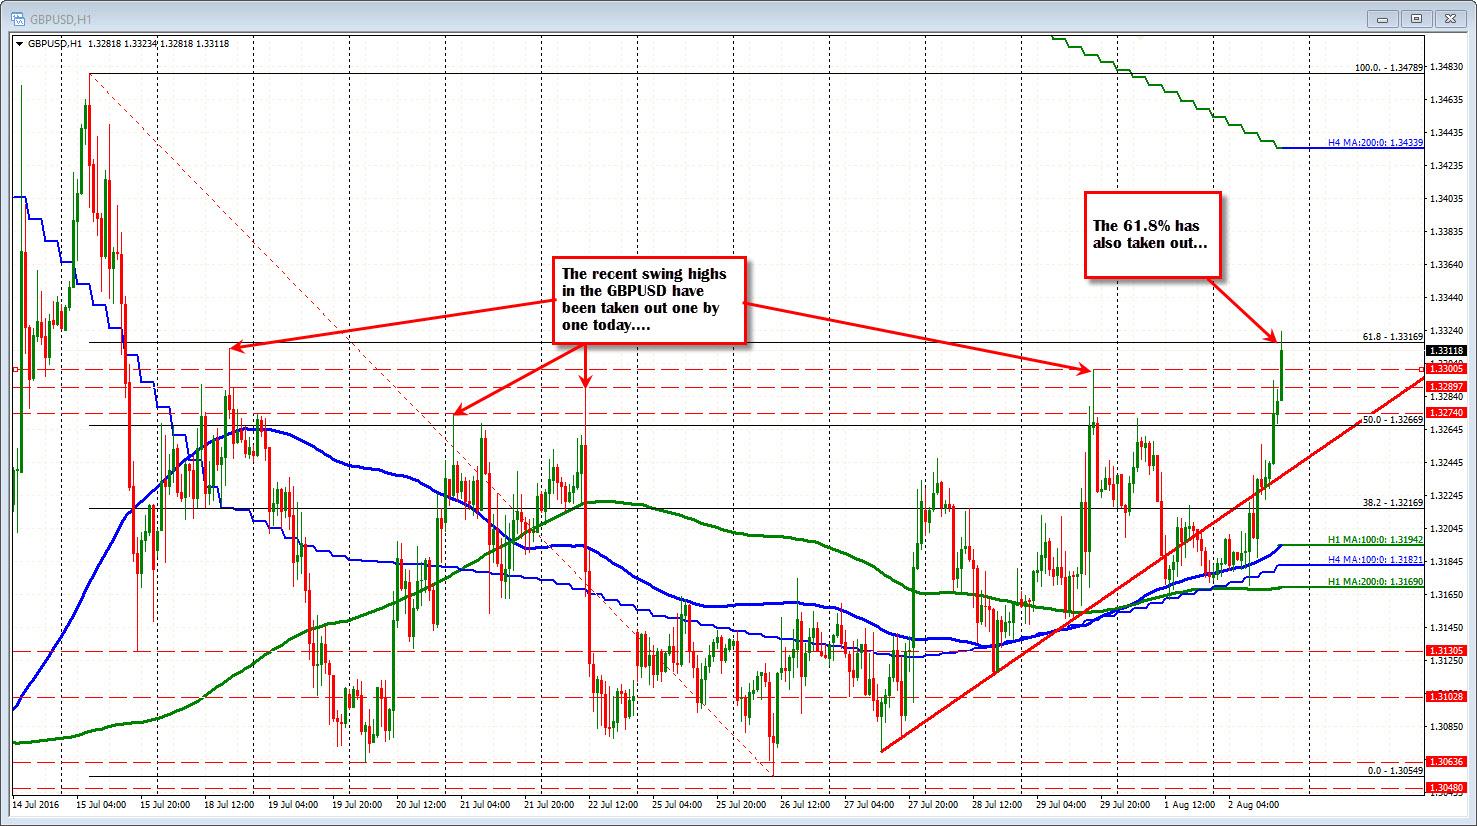 Forex economic news analysis